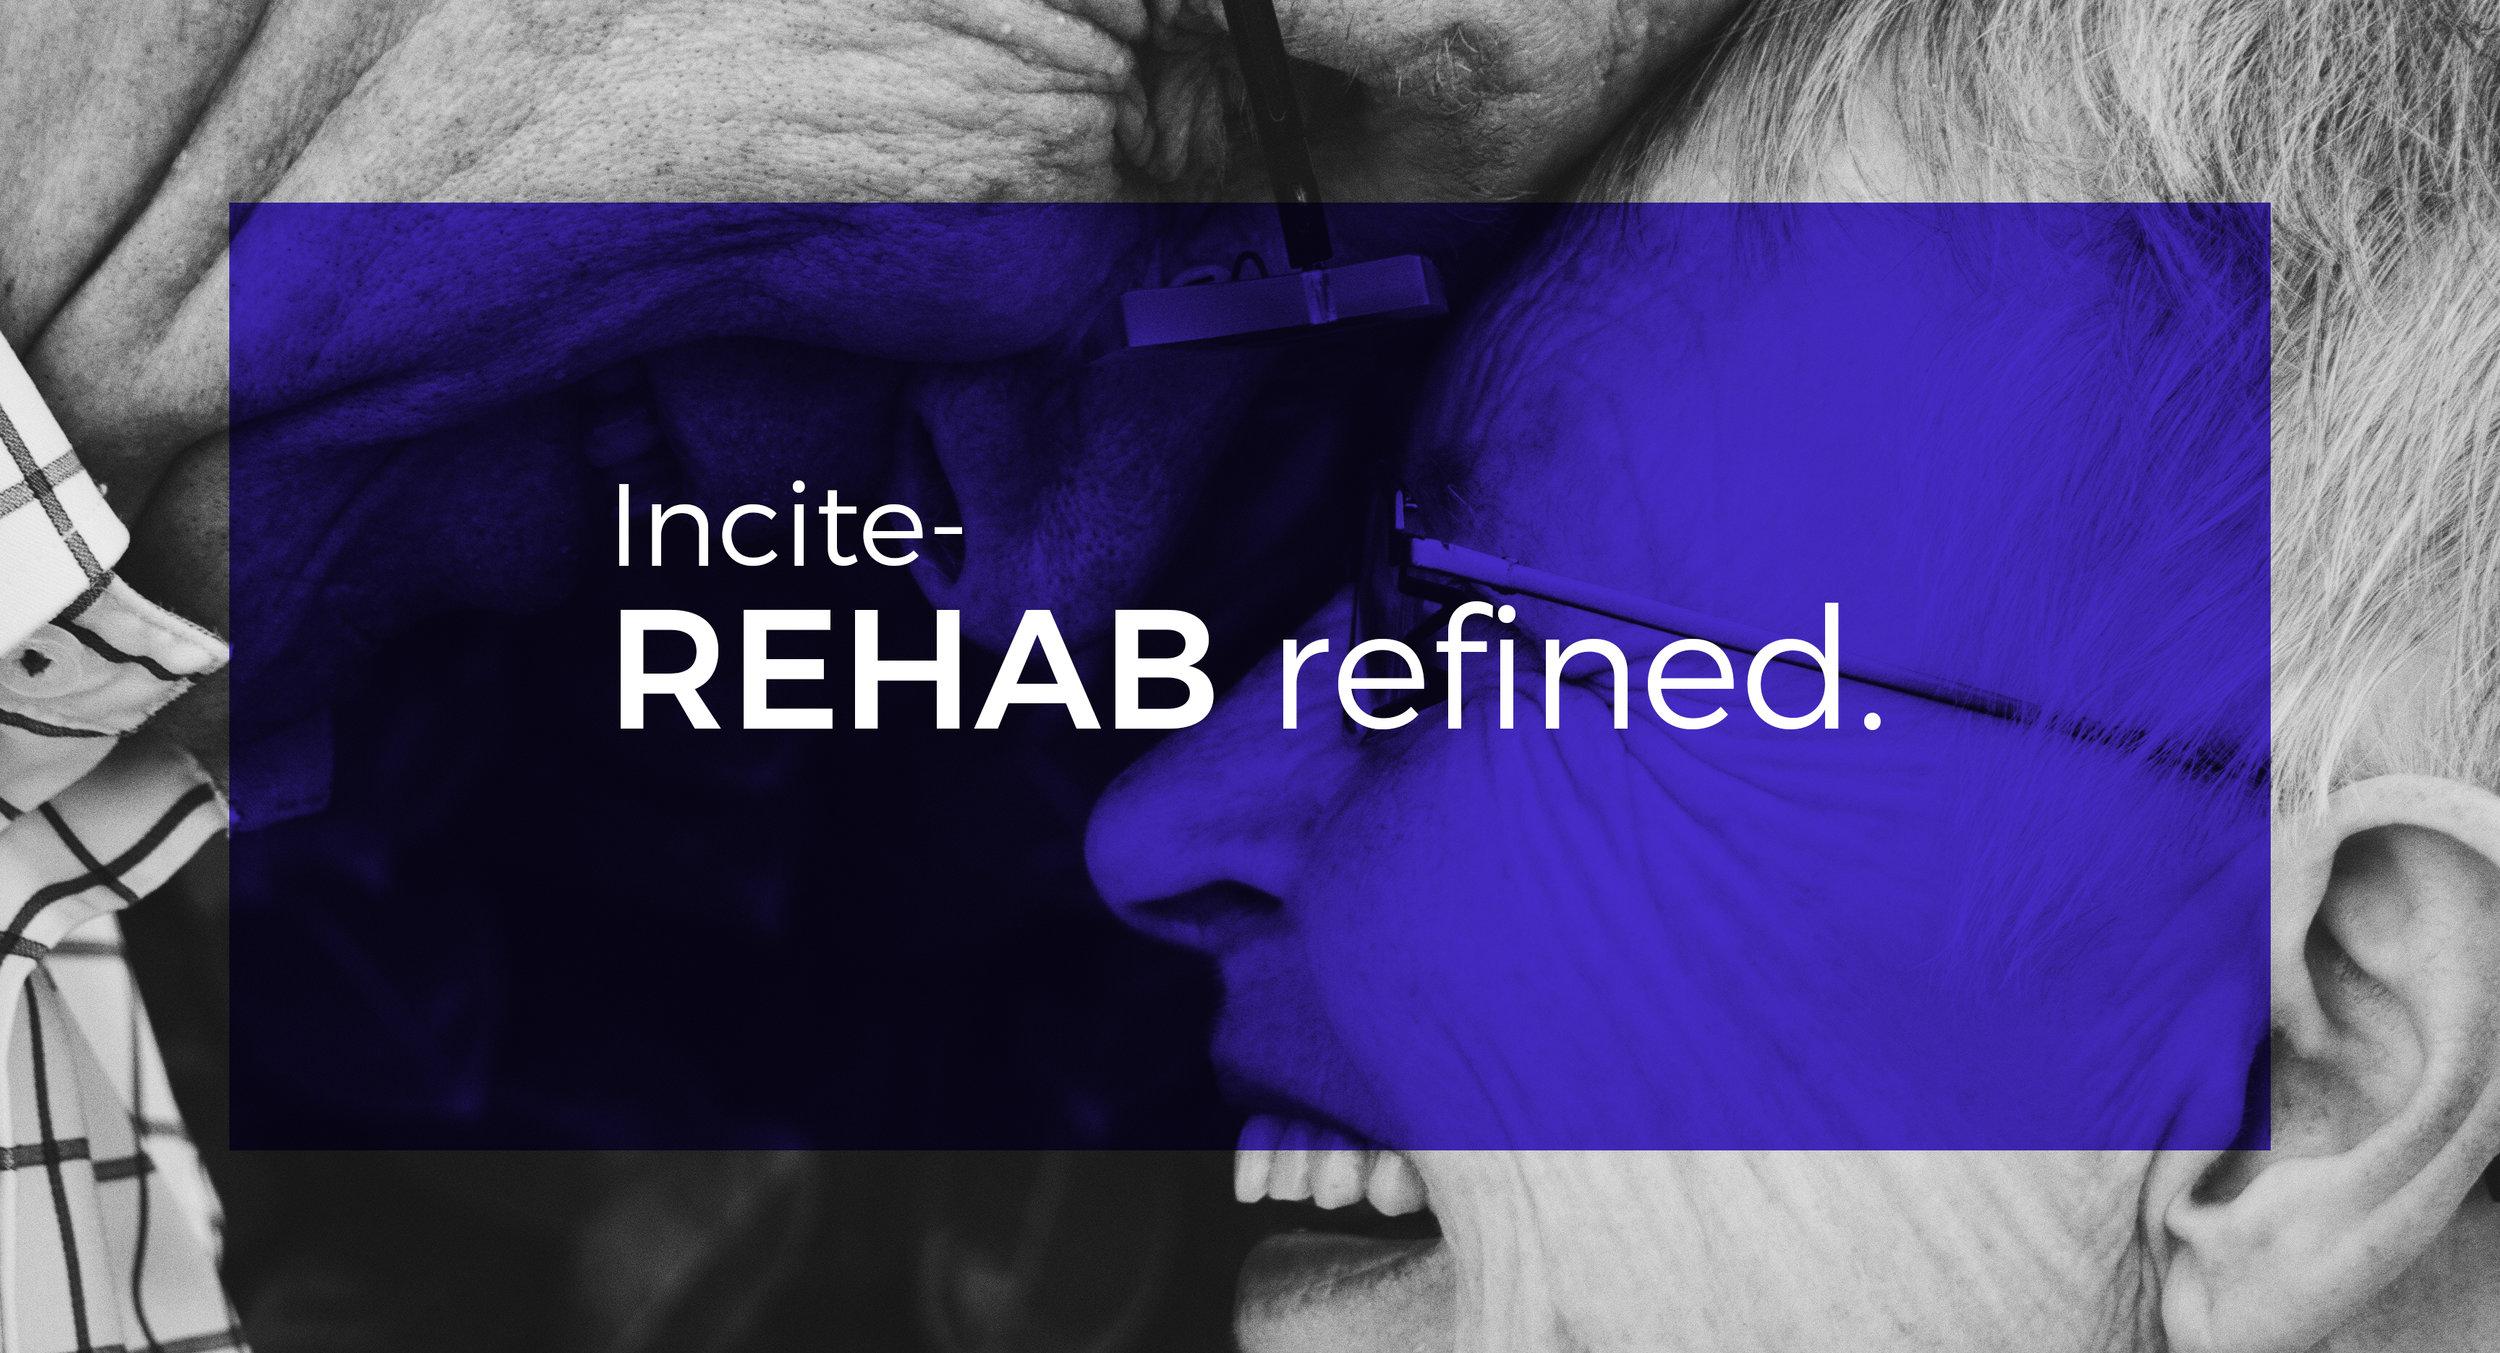 rehab_refined copy.jpg